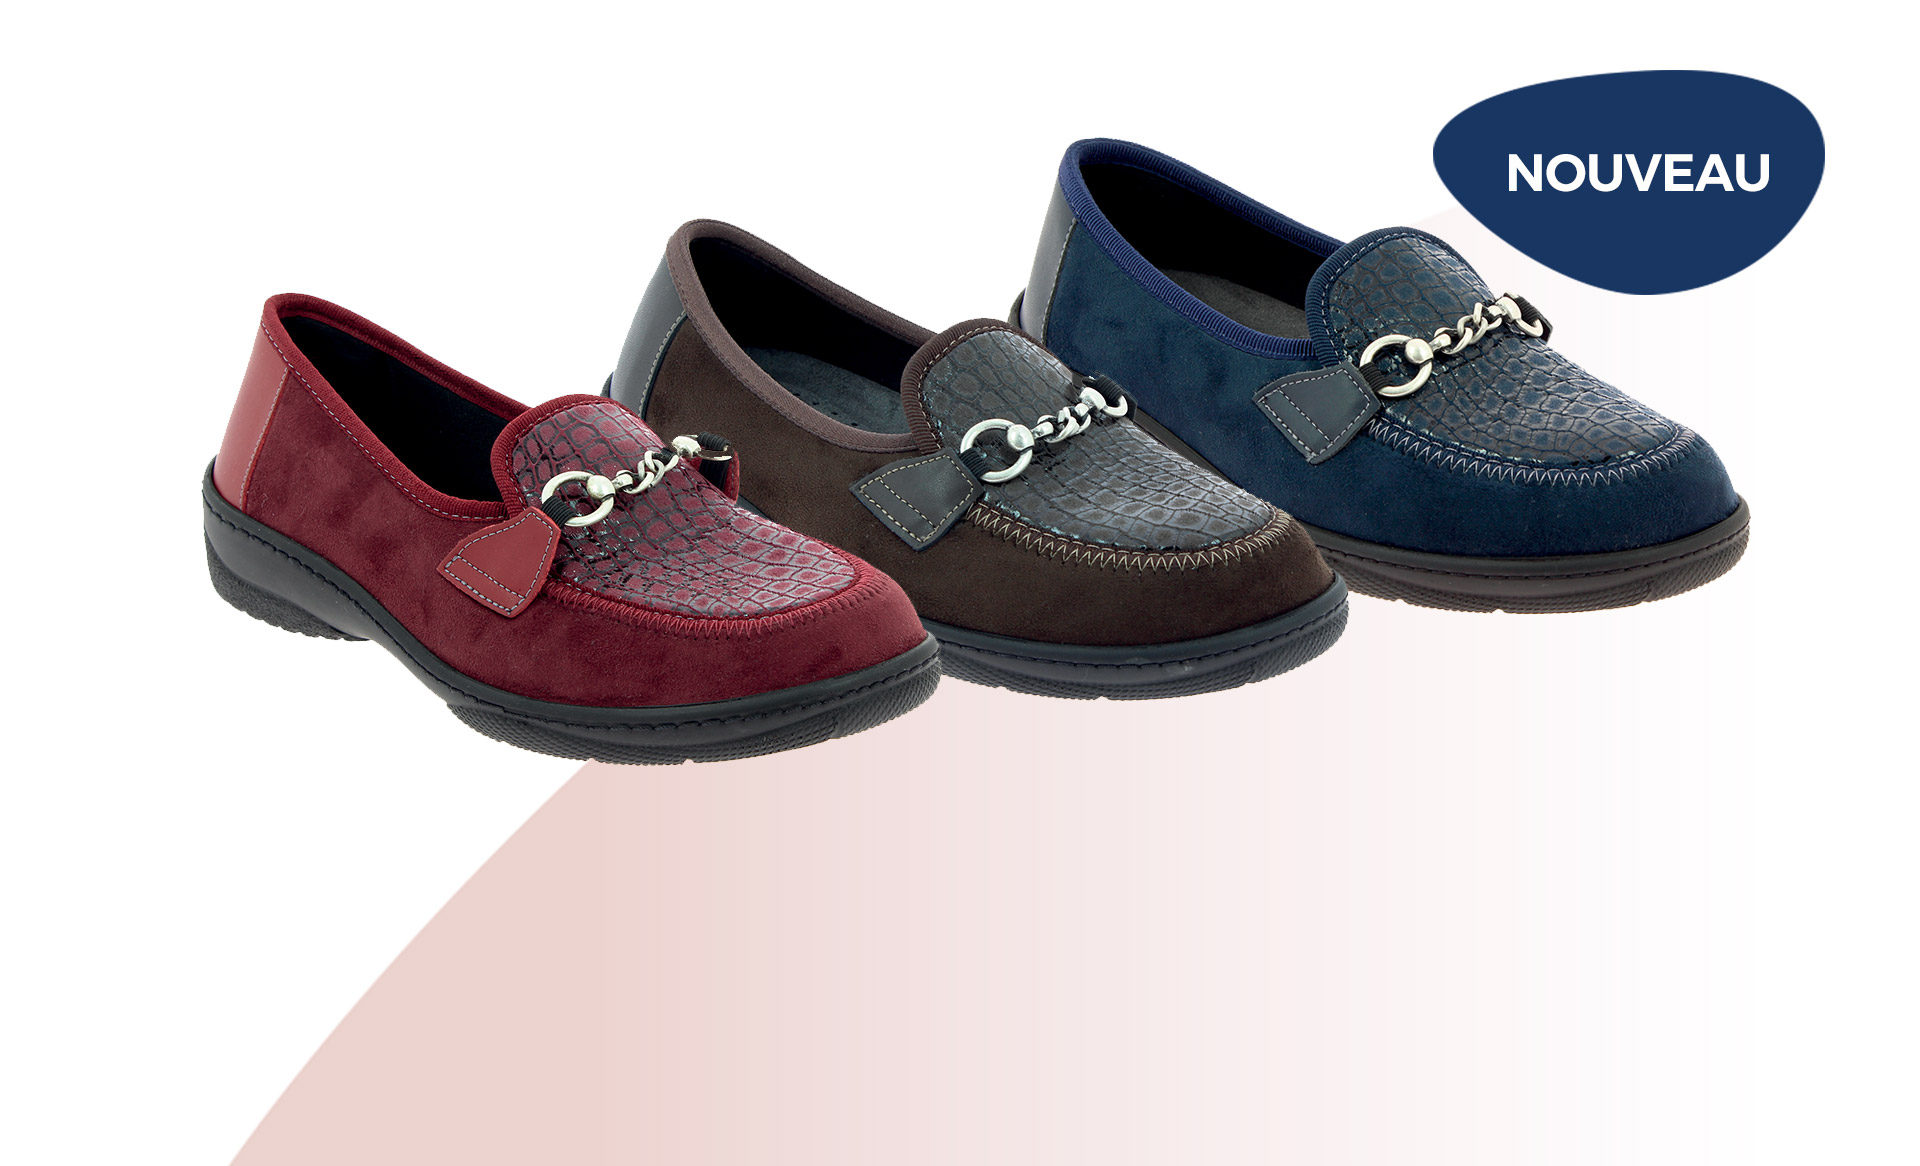 Chaussures orthopédiques CHUT Maeliss